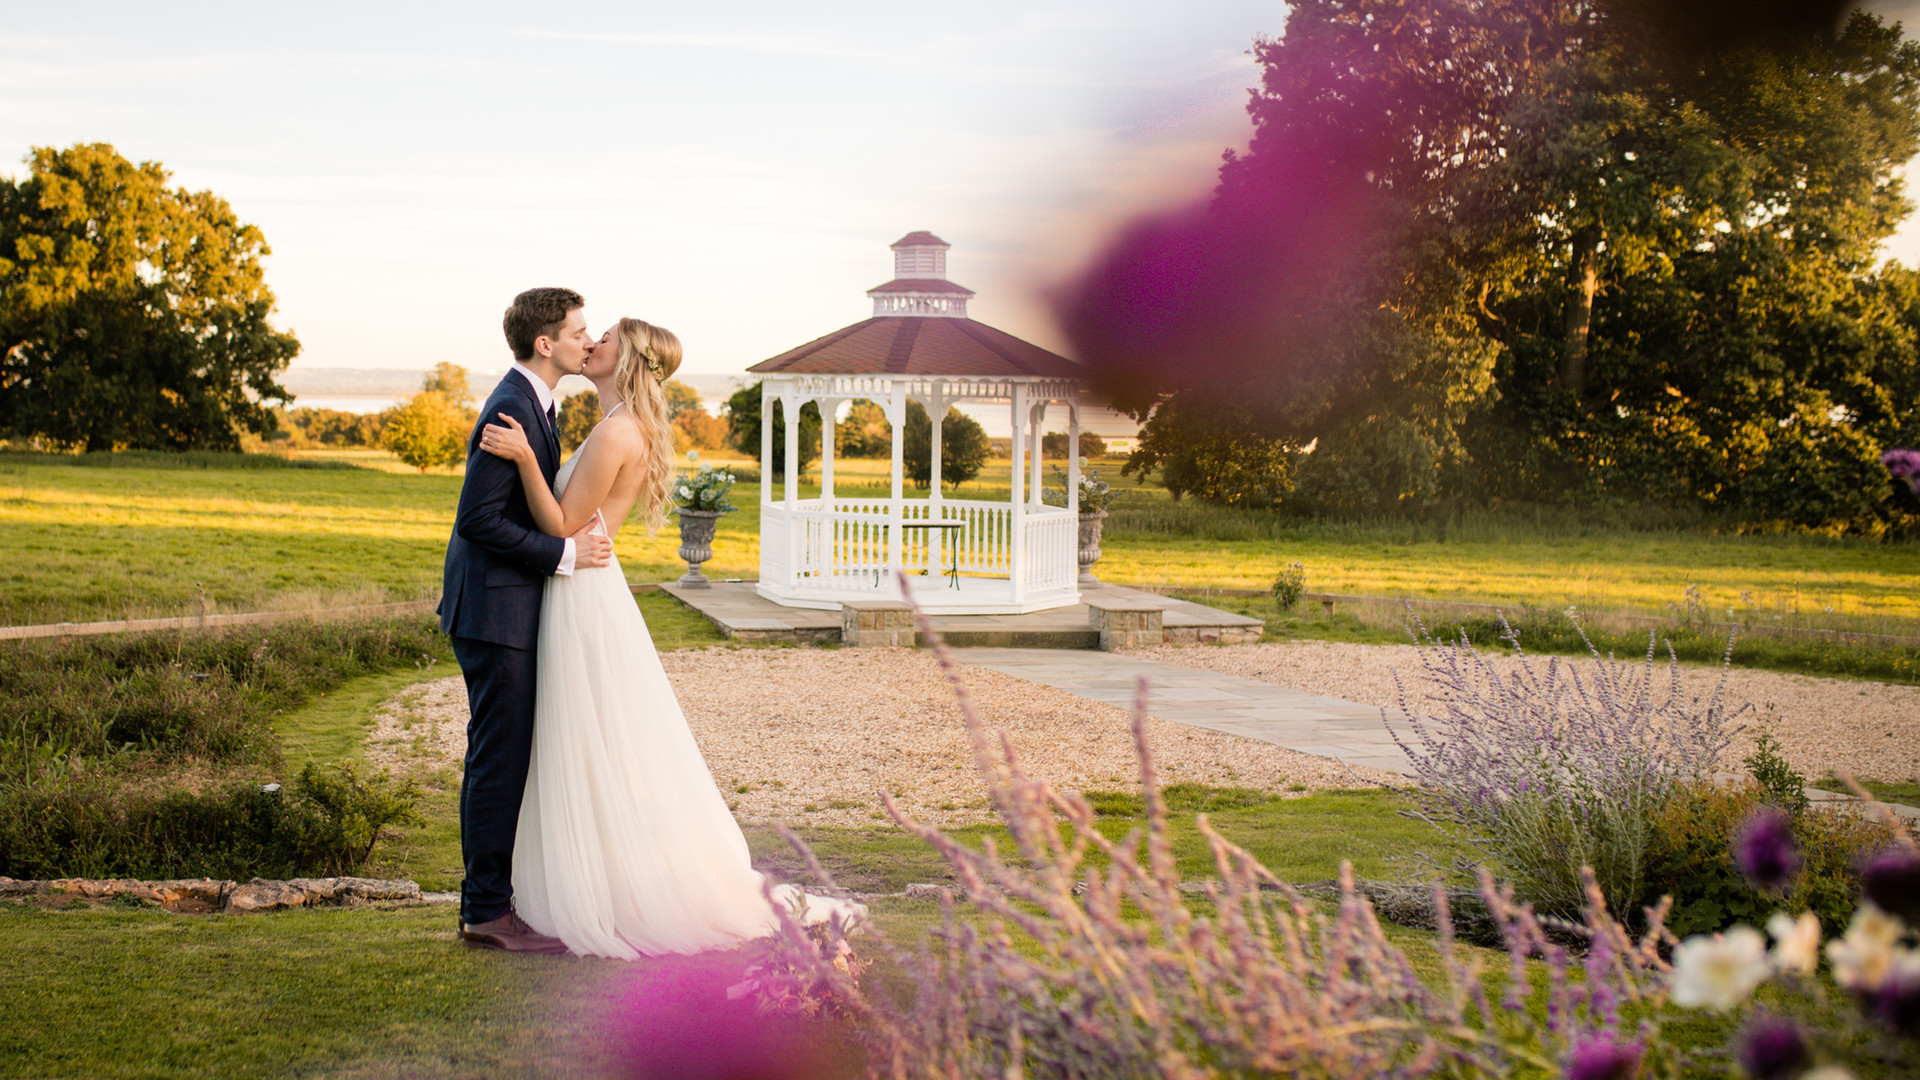 st-tewdricks-wedding-photographer-1.jpg